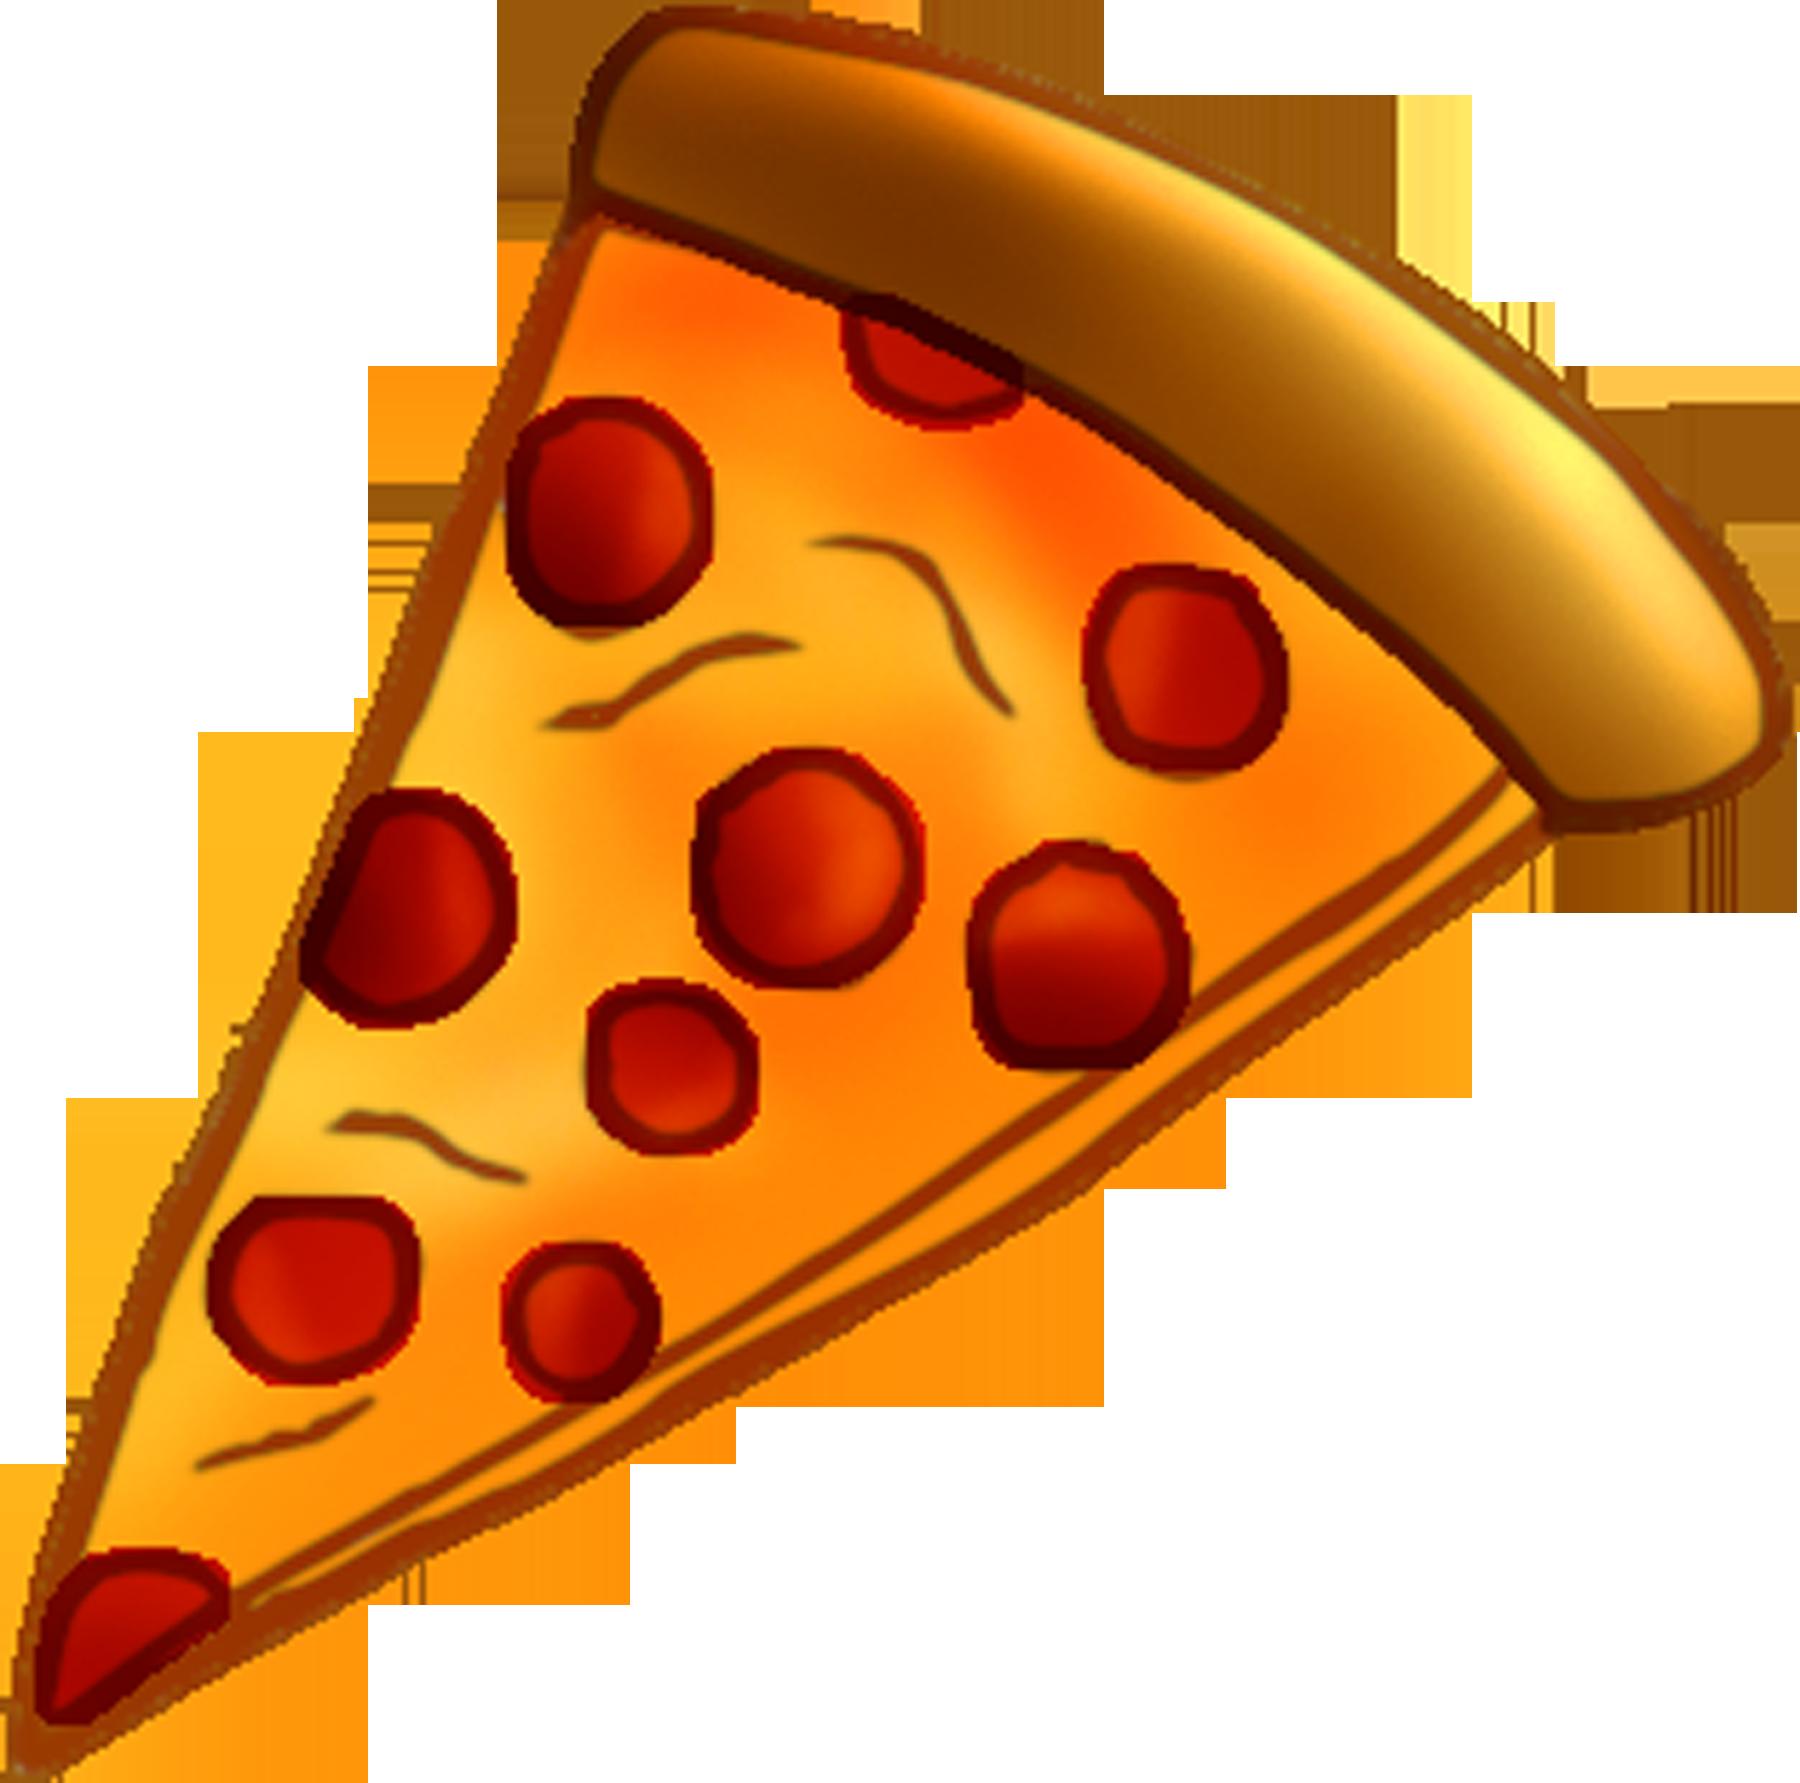 1800x1783 Clip Art Of Pizza Many Interesting Cliparts